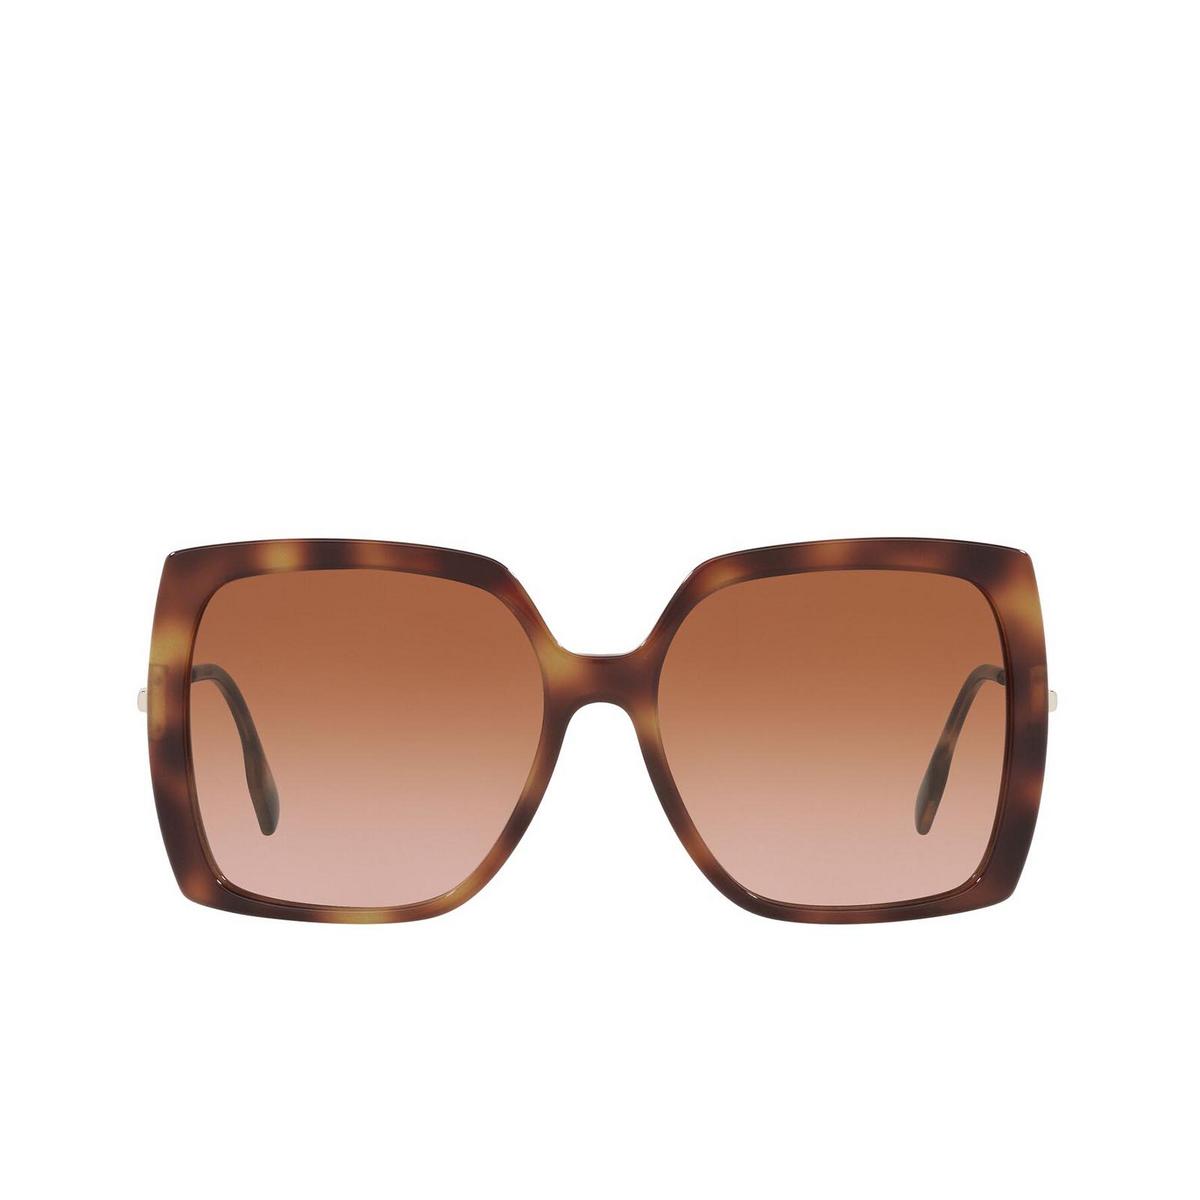 Burberry® Square Sunglasses: Luna BE4332 color Light Havana 331613 - front view.